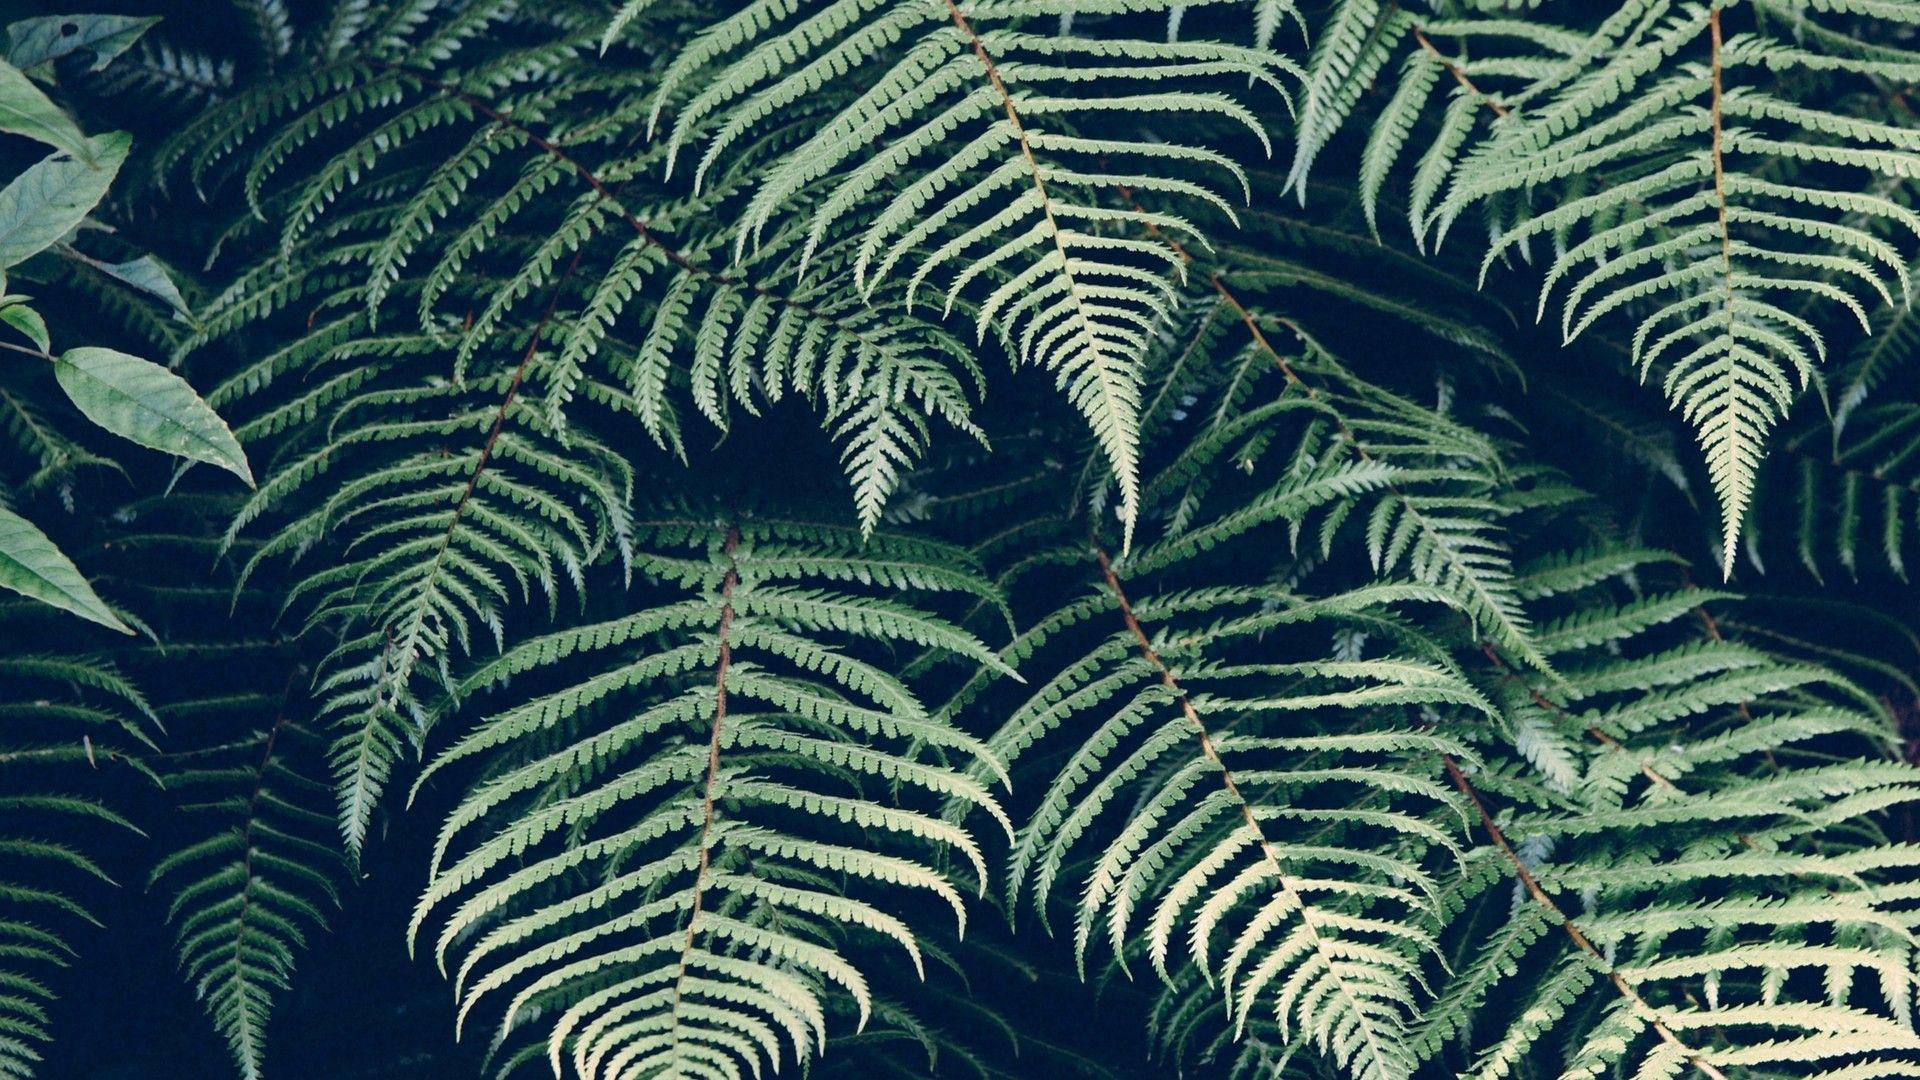 Leaf Pattern 1920x1080 wallpaper